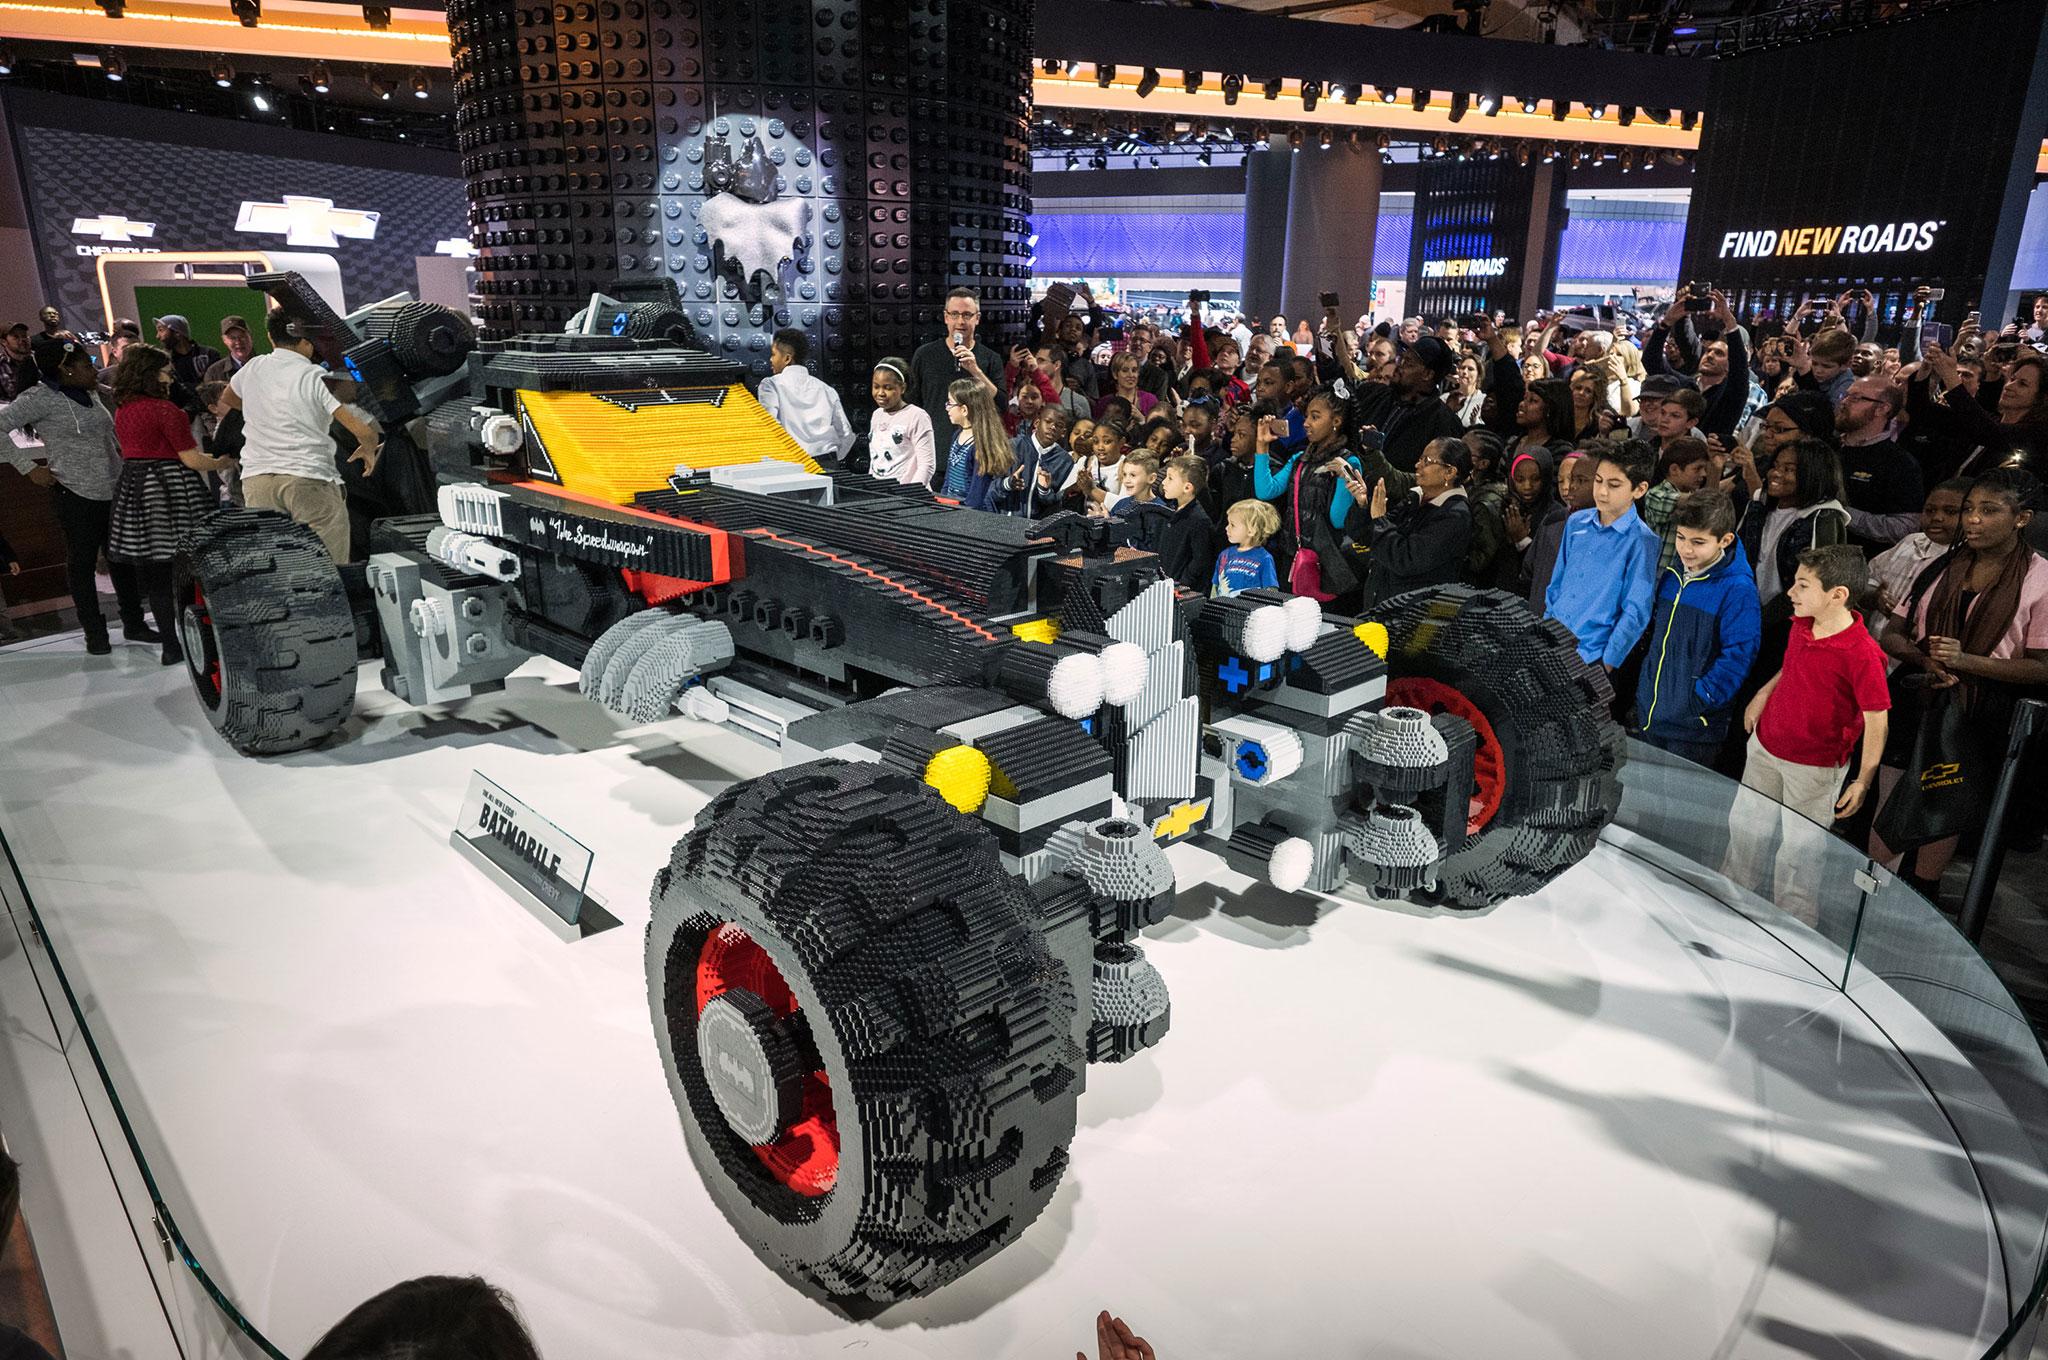 Chevrolet Introduces LifeSized Lego Batmobile At Detroit Auto Show - Autoshow